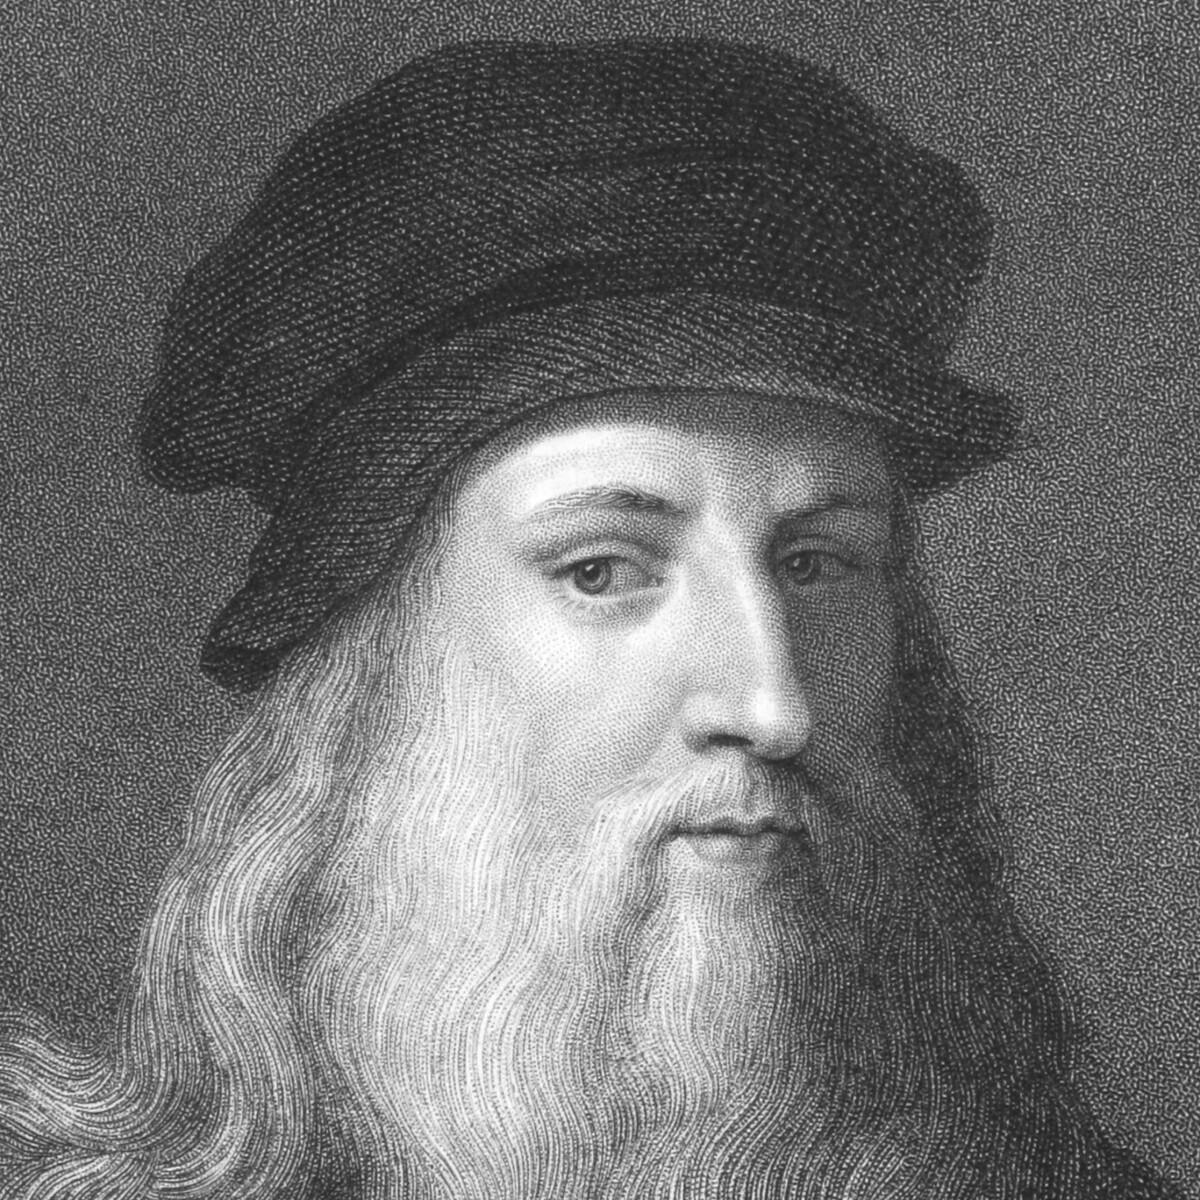 Leonardo da Vinci | Art, Biography & Art for Sale | Sotheby's